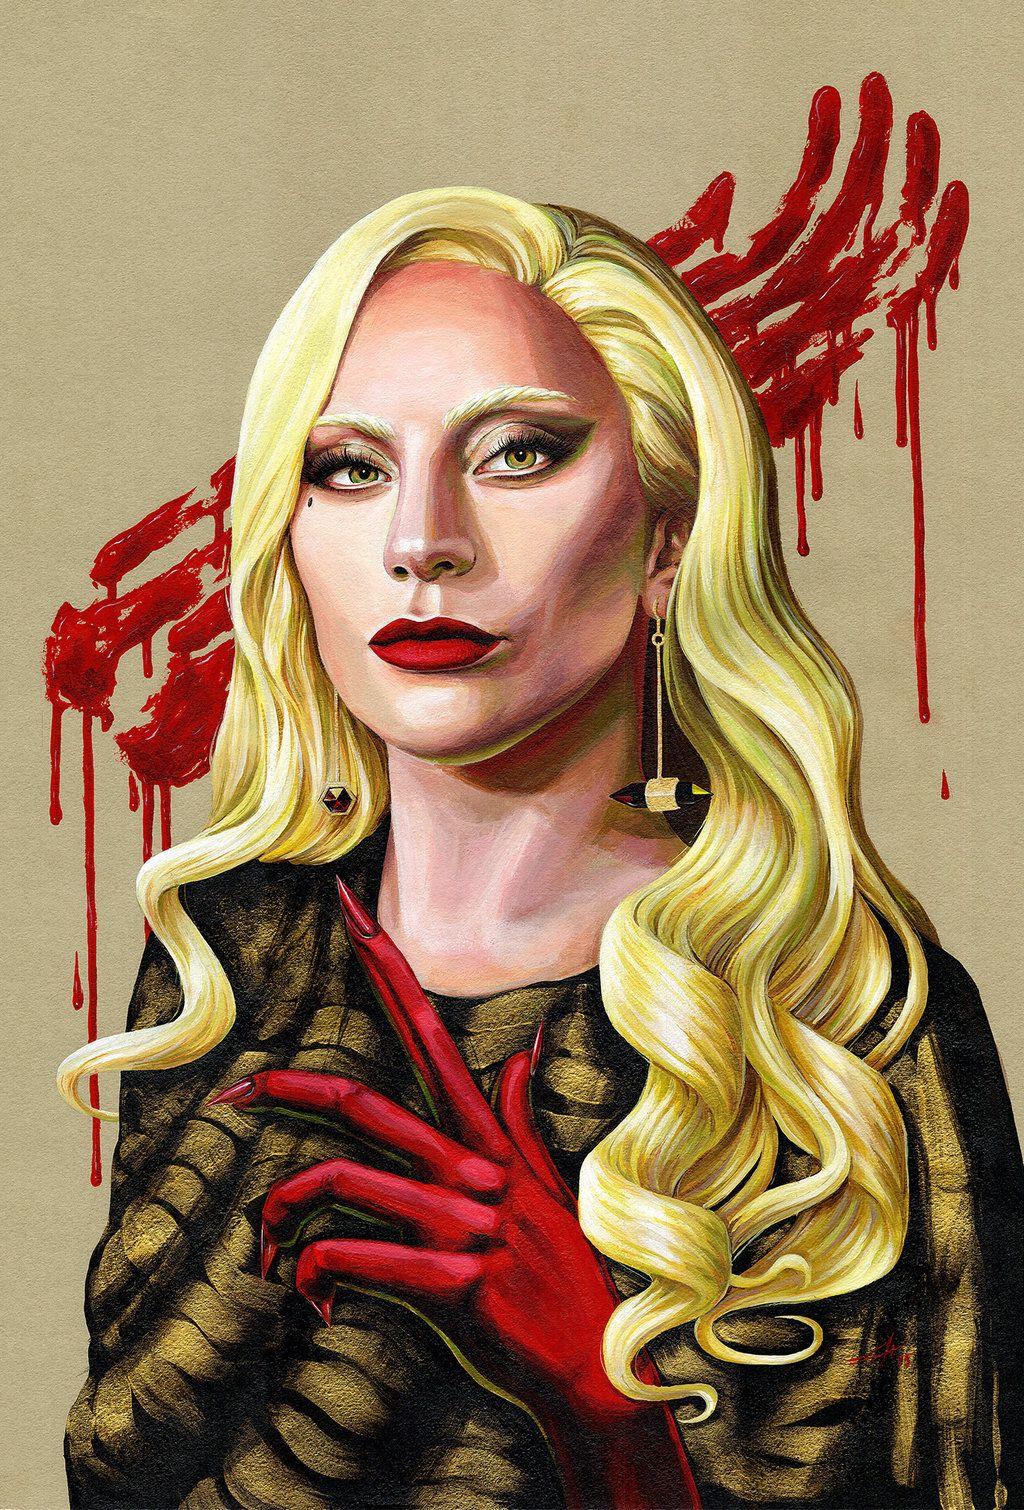 Countess Lady Gaga American Horror Story